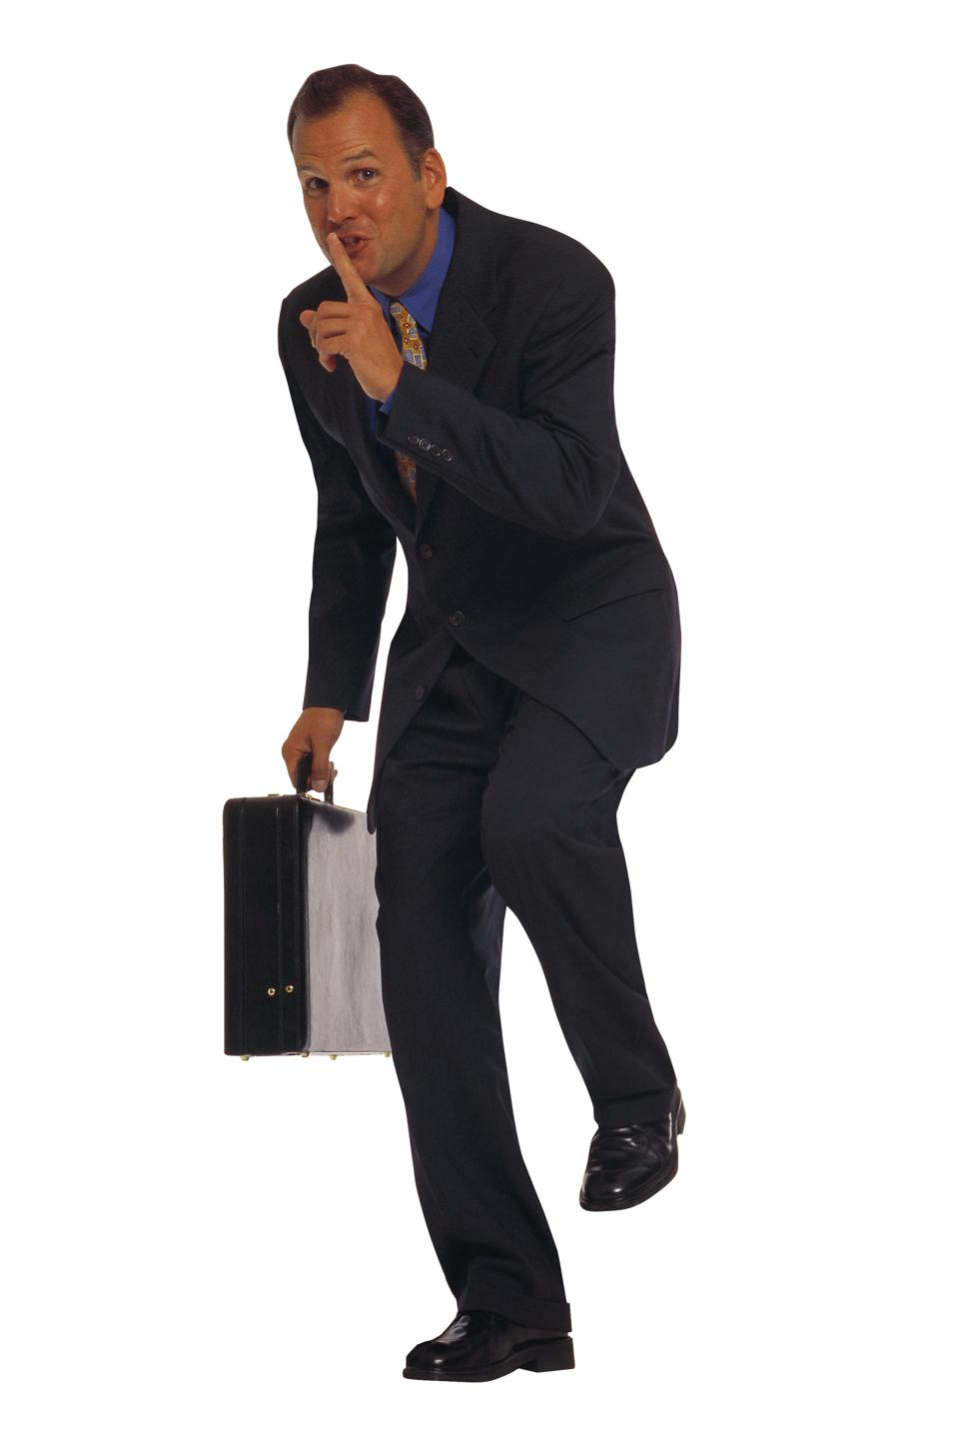 Businessman with briefcase sneaking around